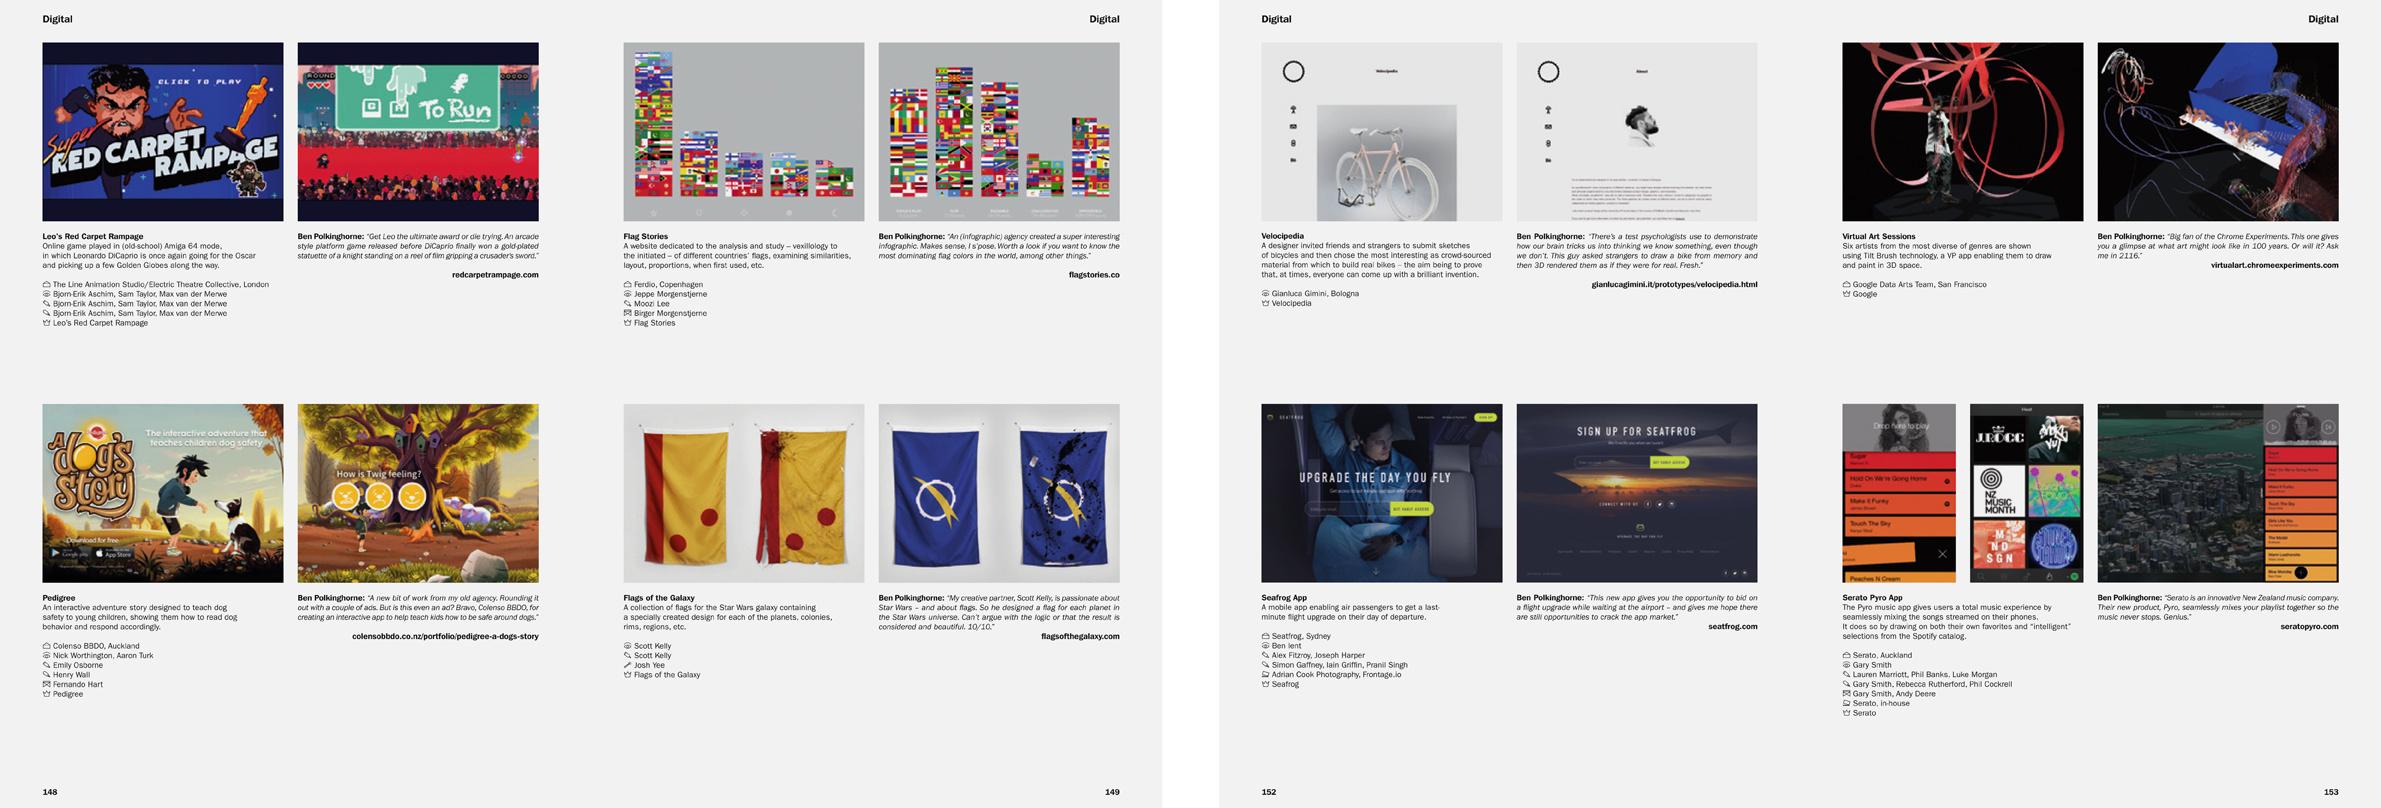 Lürzer's Archive - Out now: Vol  4-16 of Lürzer's Archive